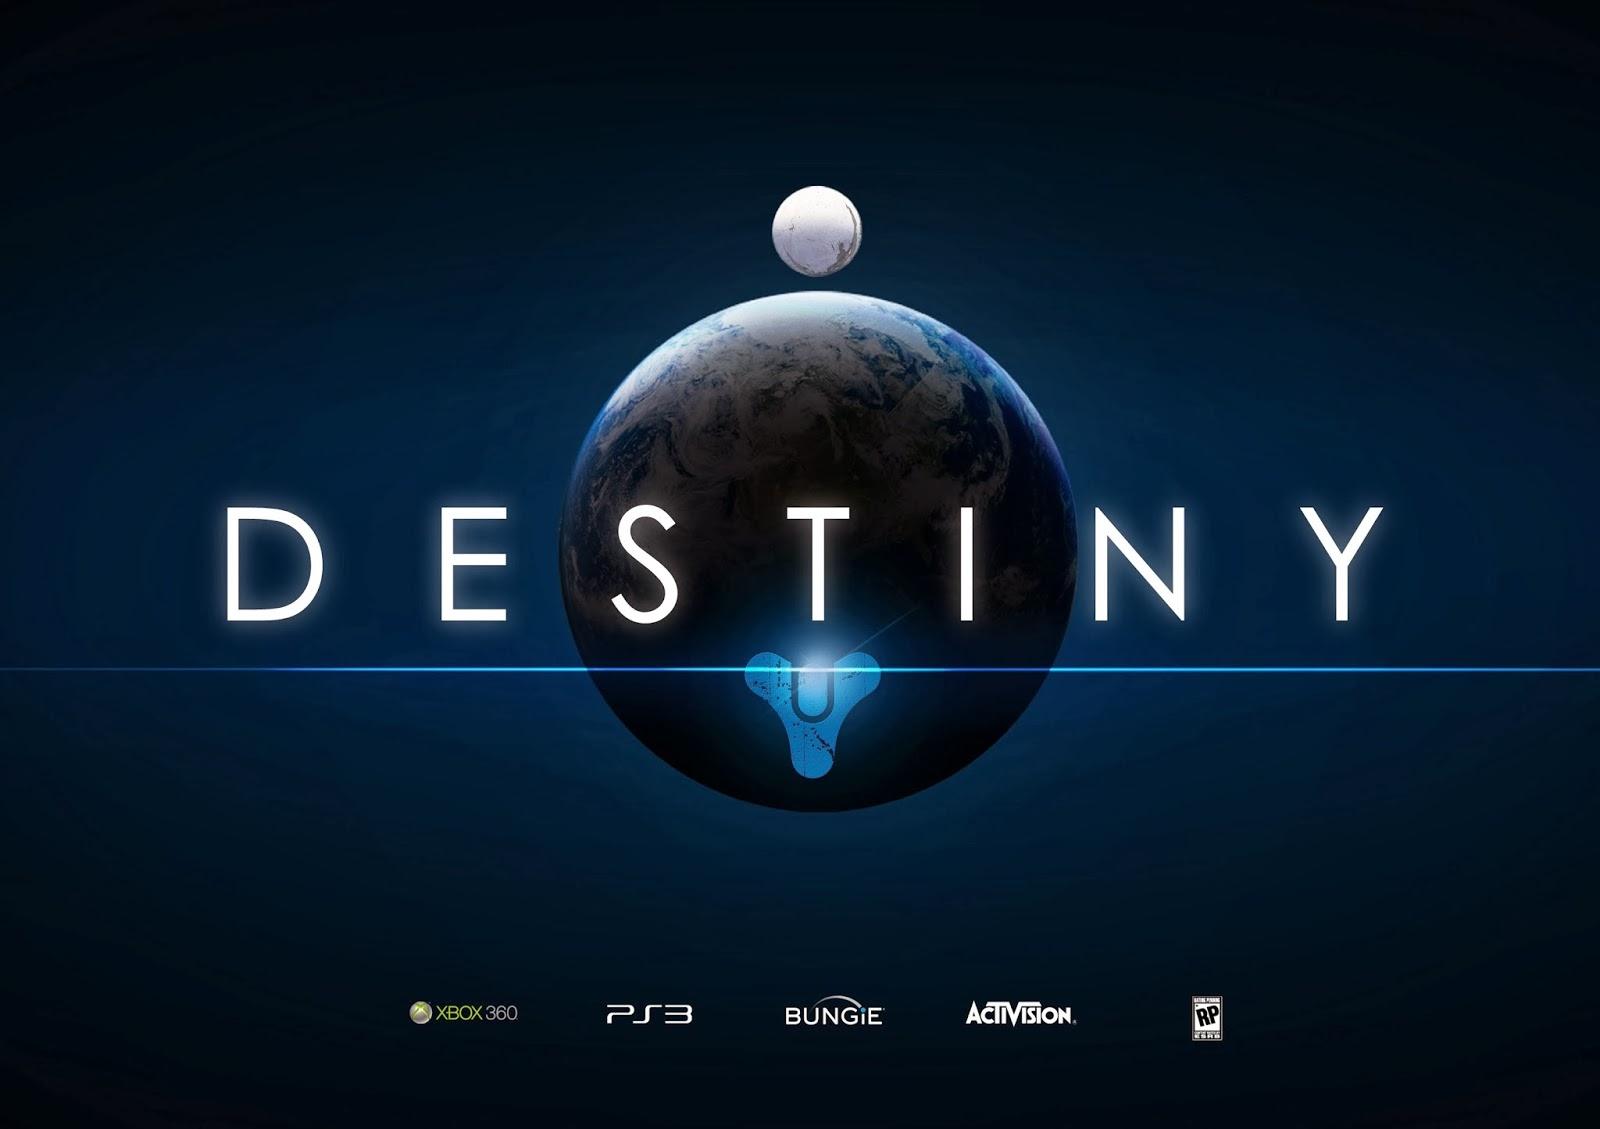 PC game Destiny screen shots